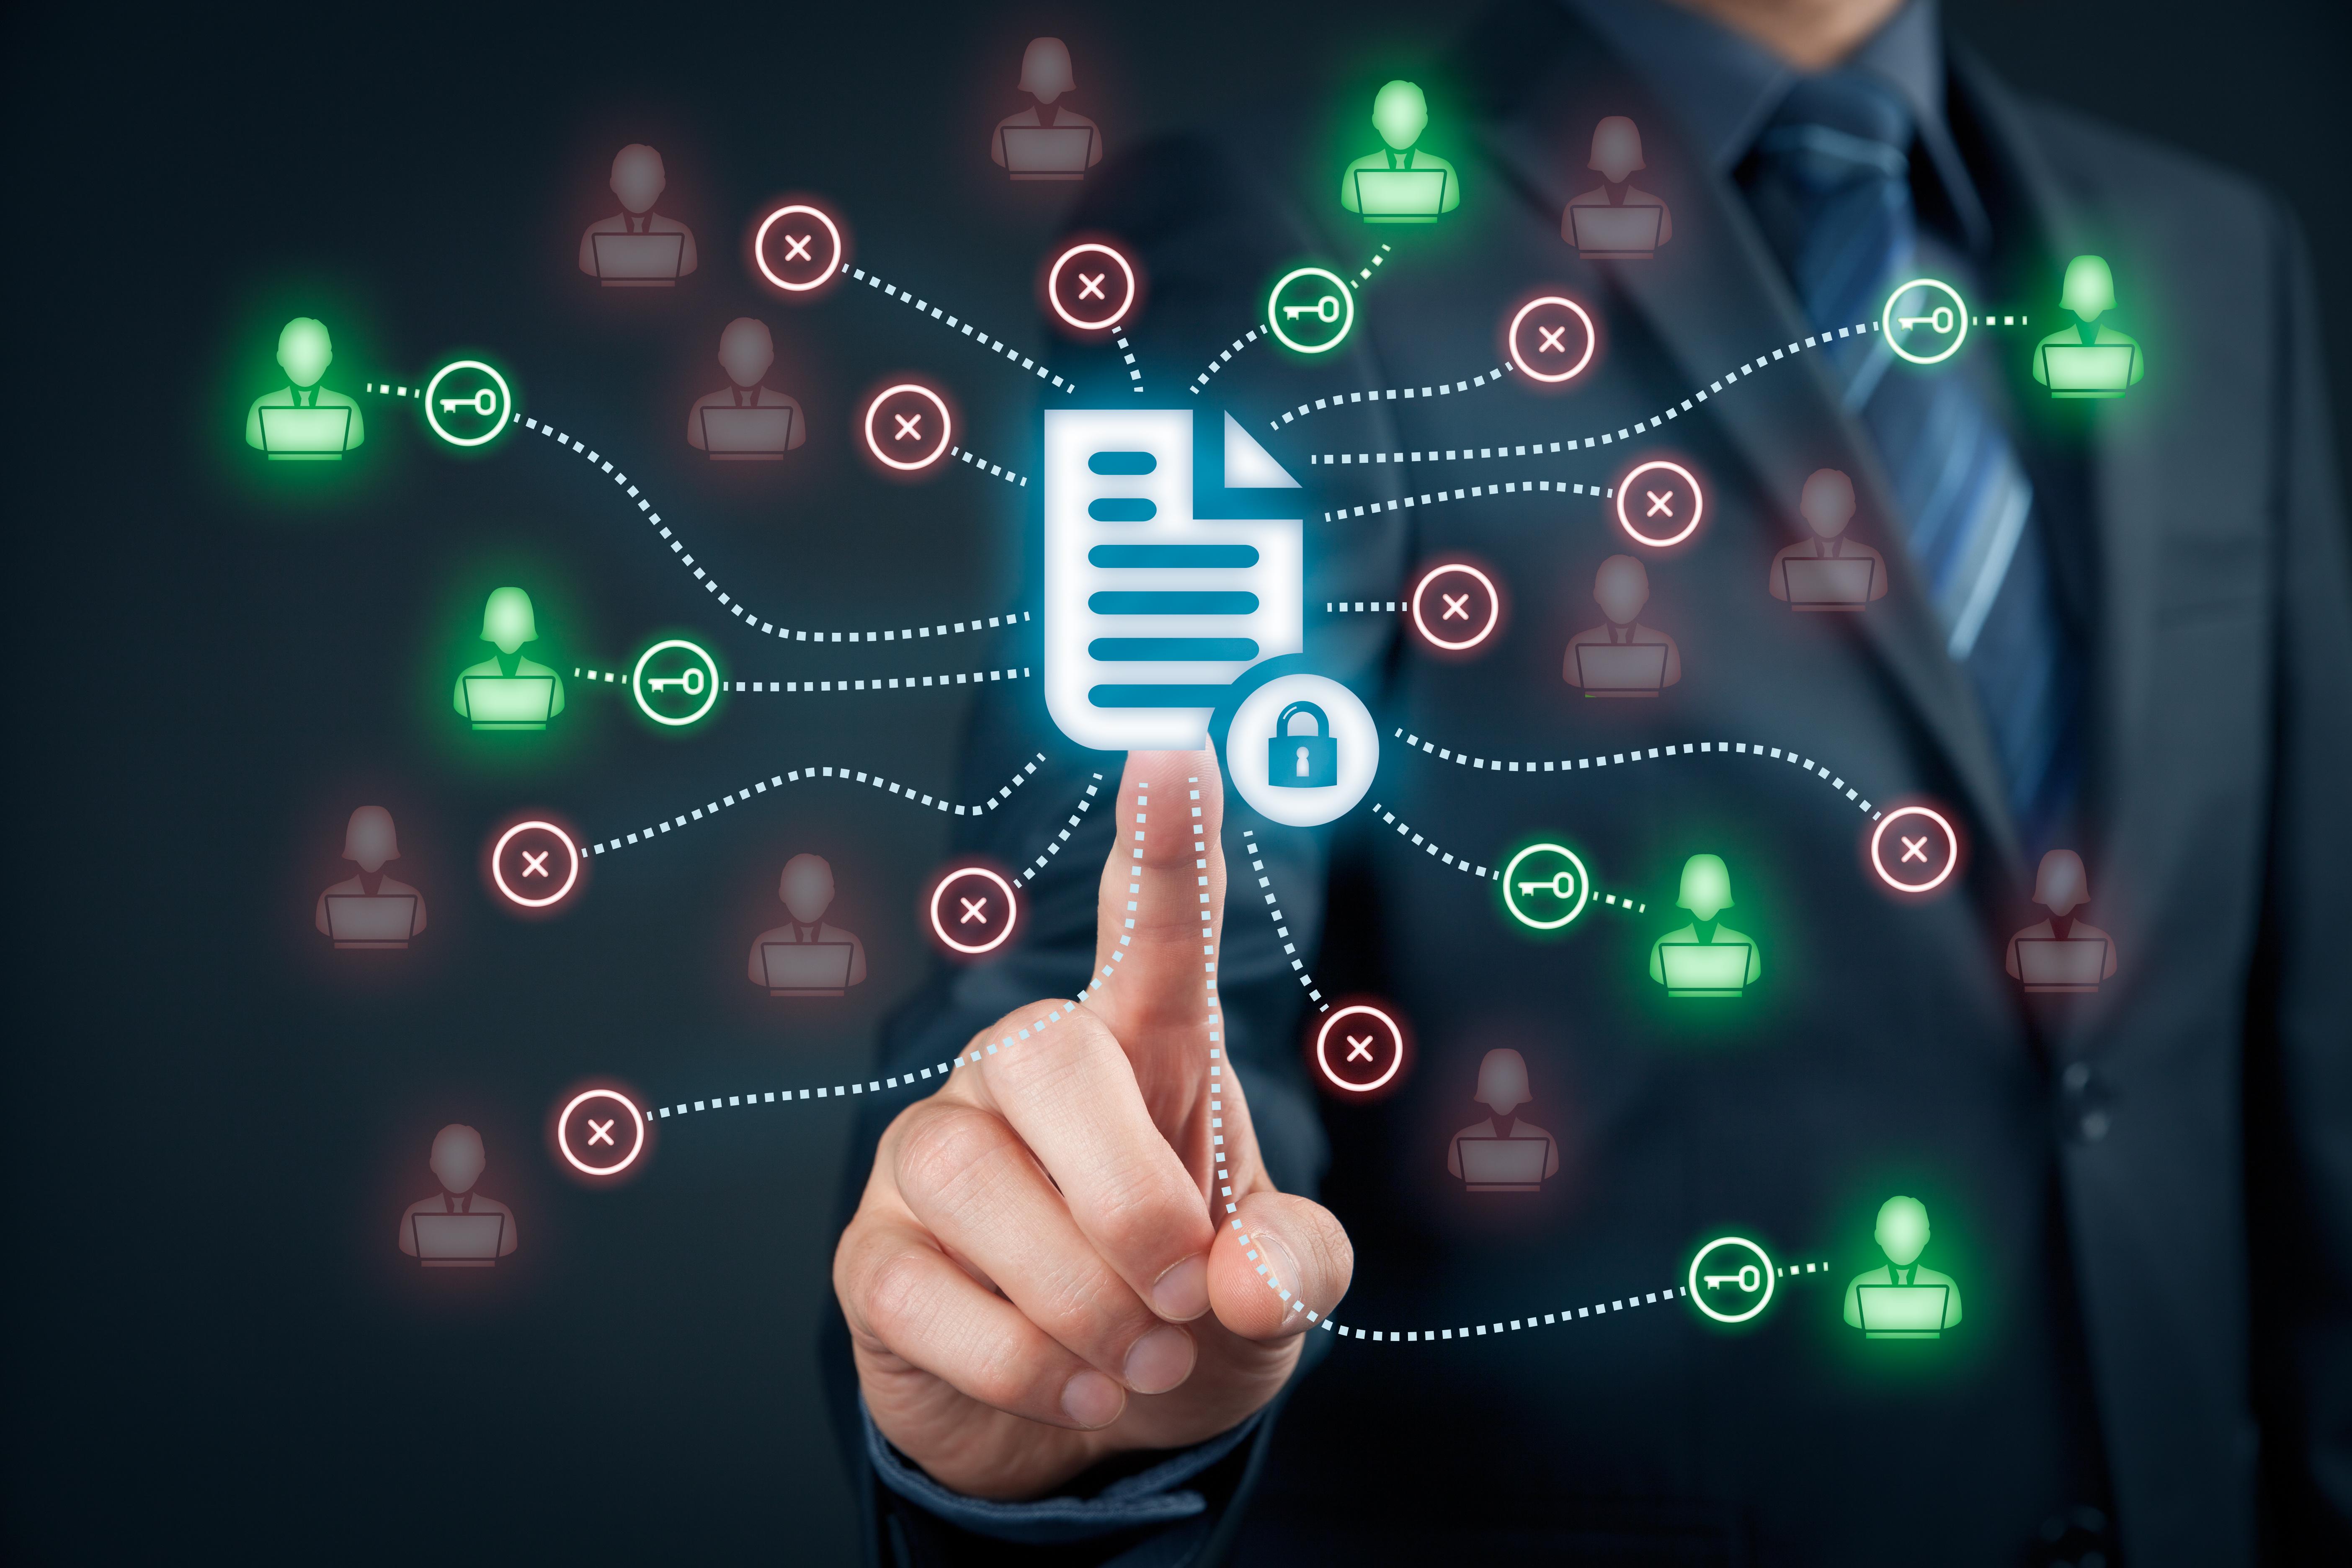 How to make digital happen